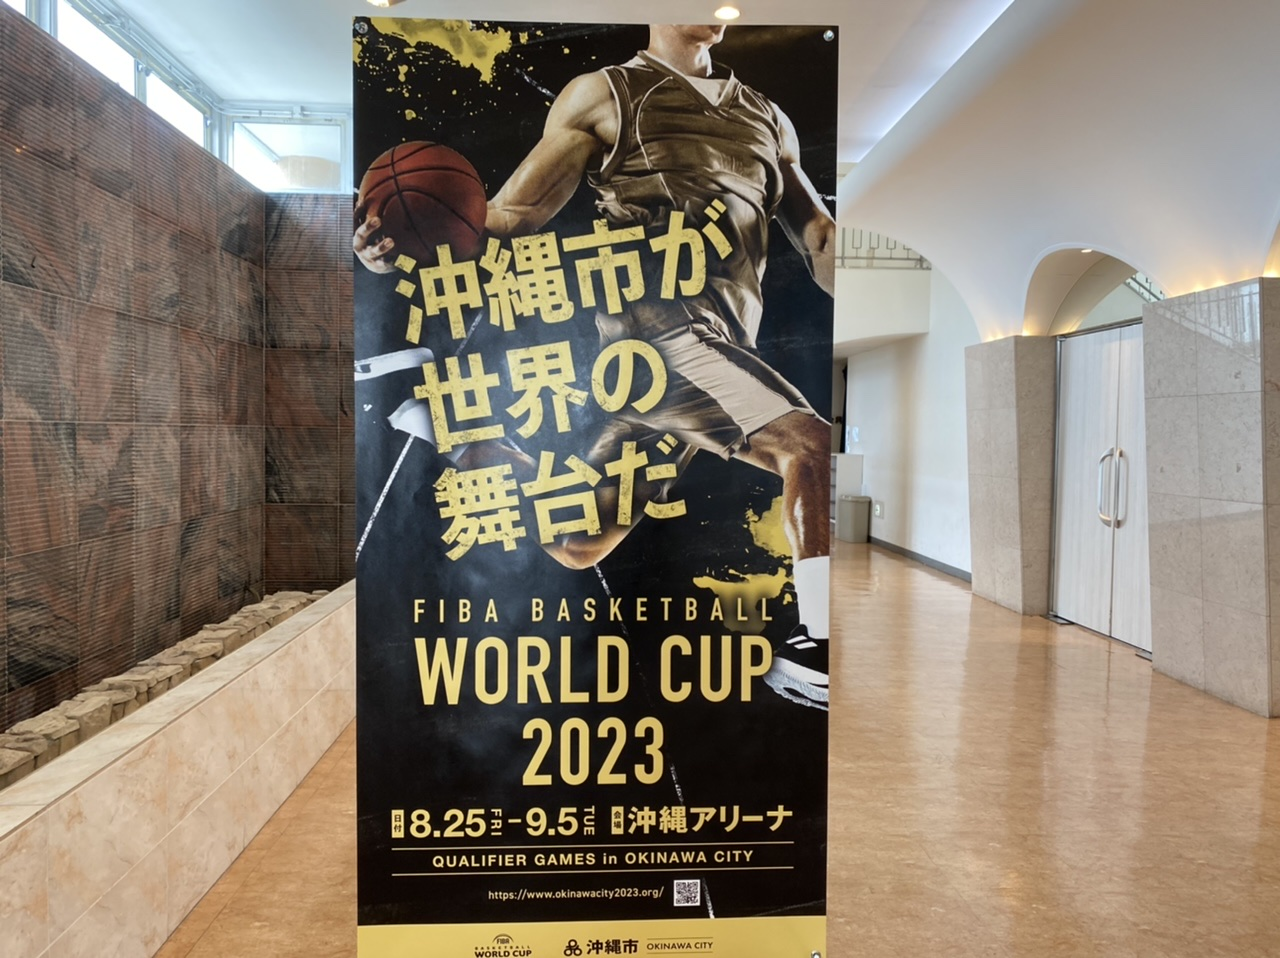 FIBAバスケットボールワールドカップ2023受入体制構築シンポジウム